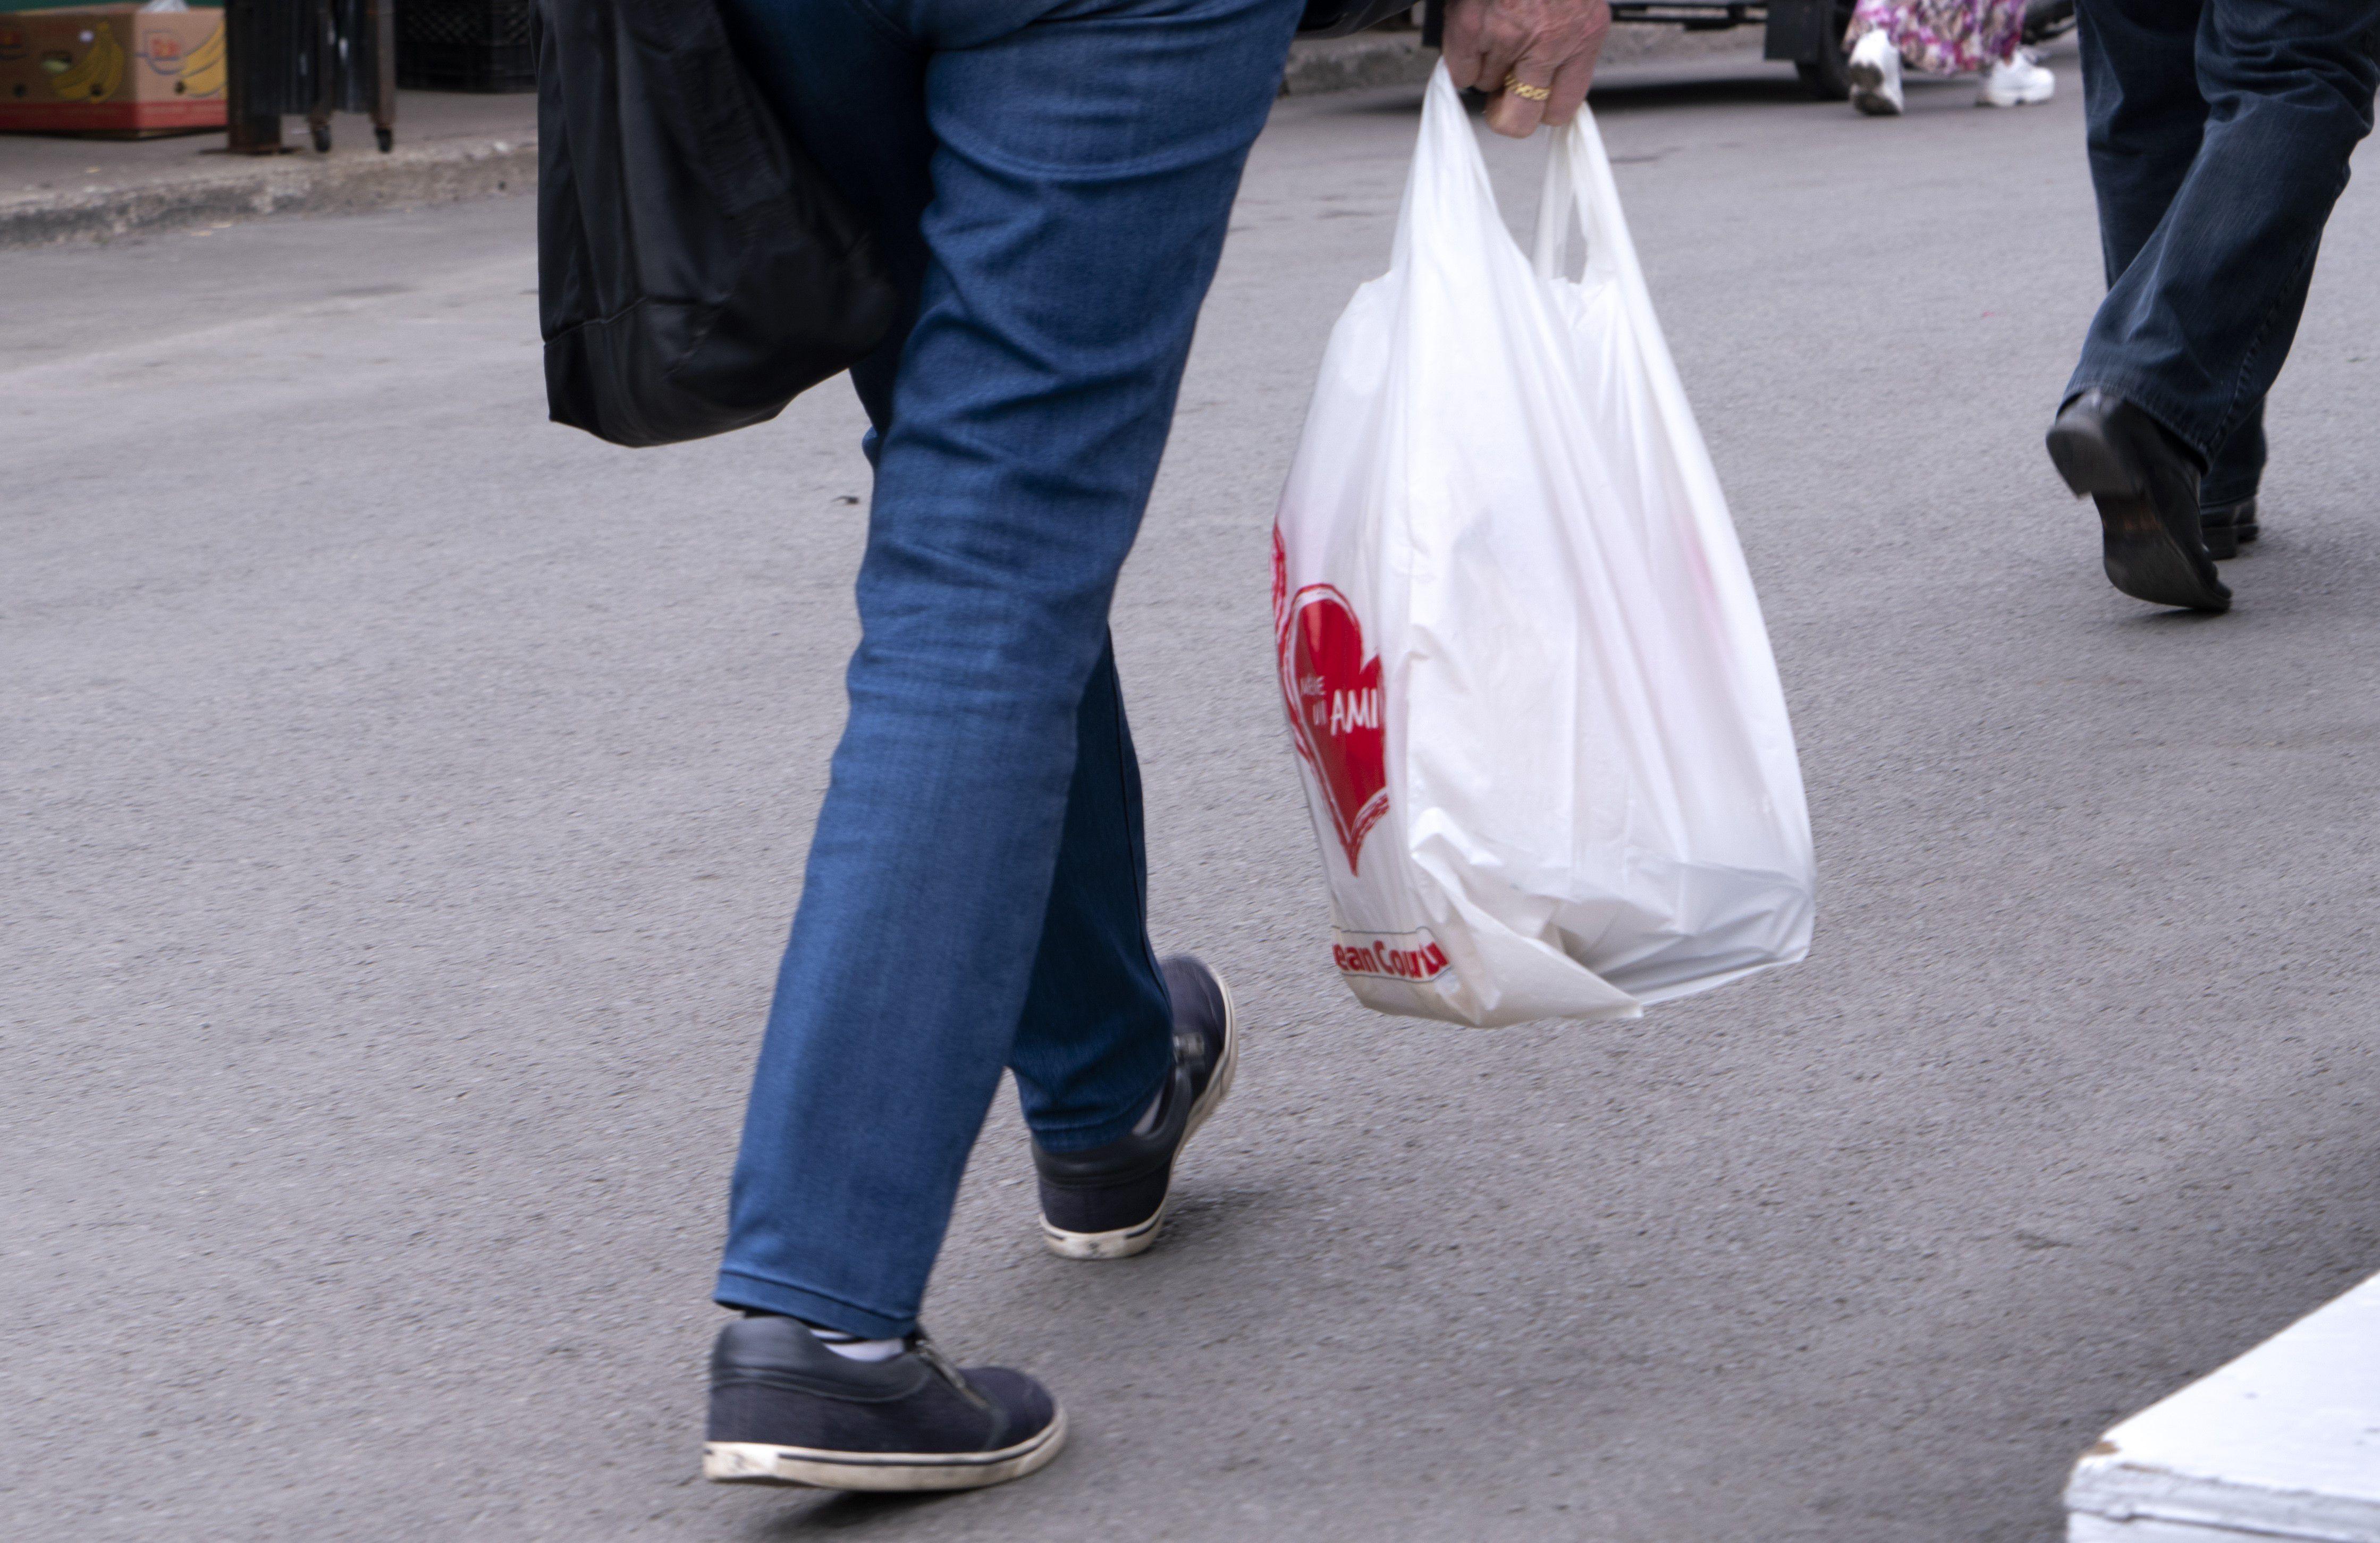 B C  municipalities intent on banning single-use plastic bags asking